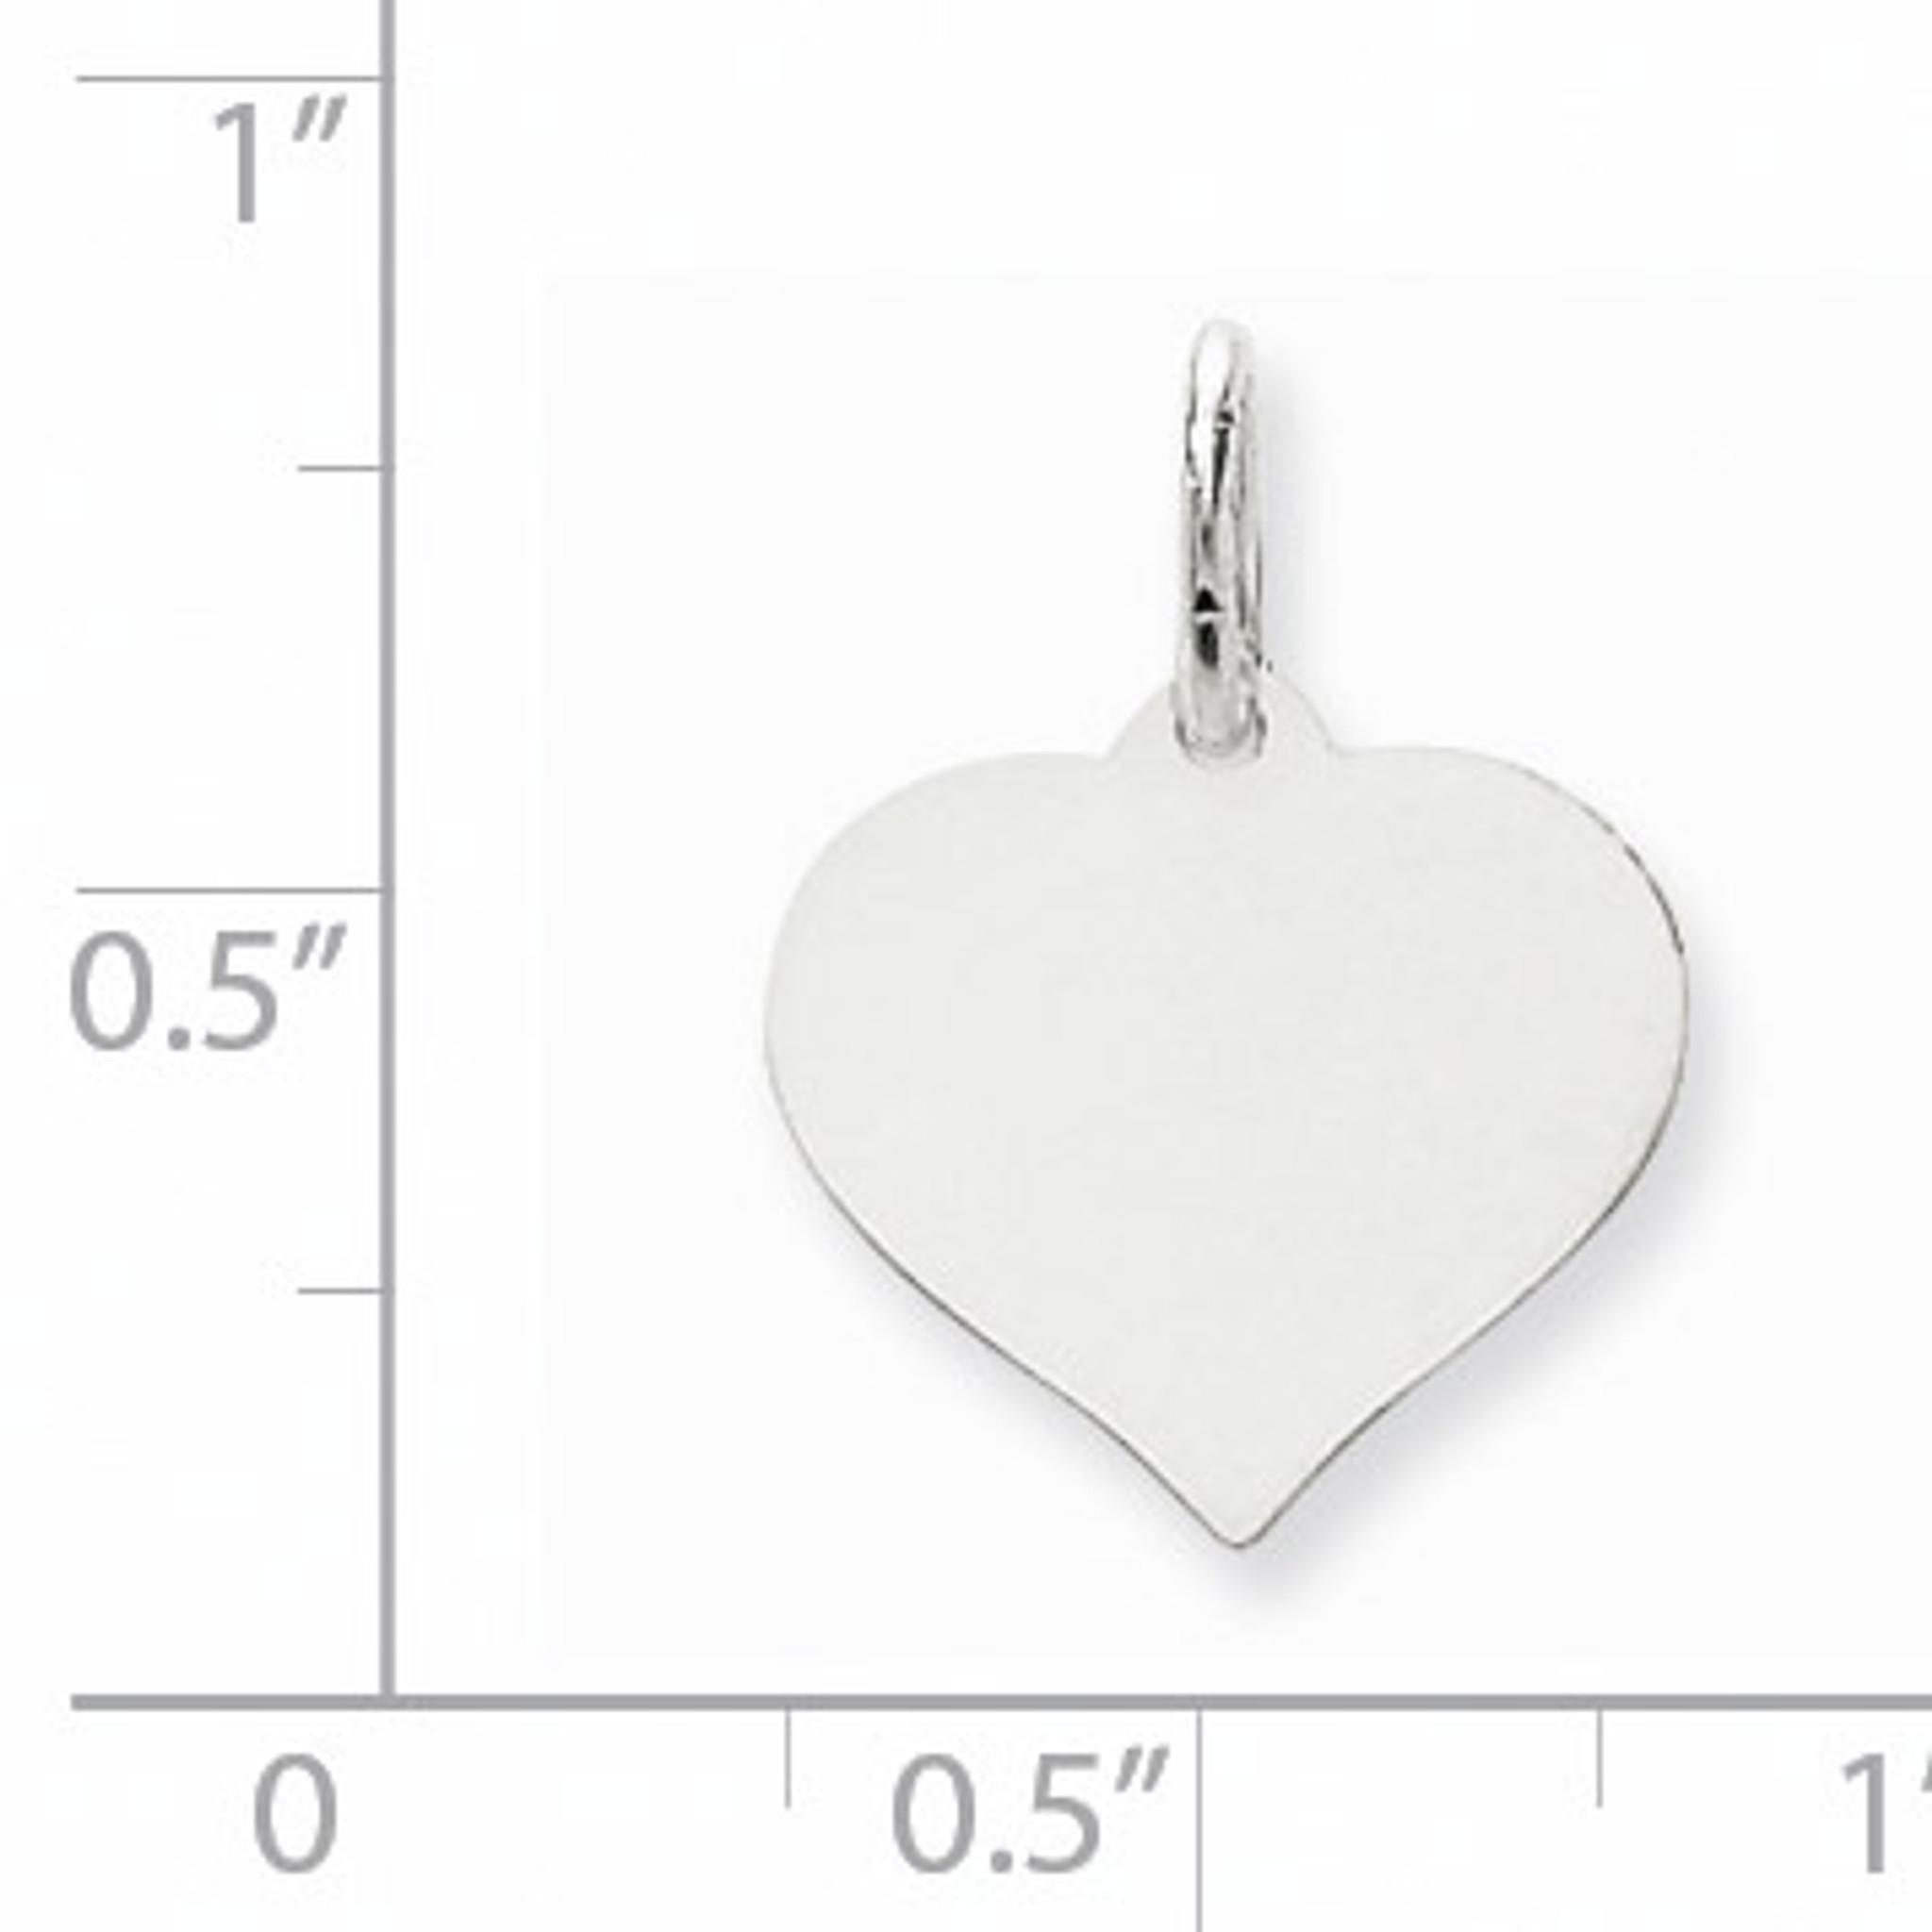 10mm x 14mm Jewel Tie 14k White Gold Heart Disc Pendant Charm